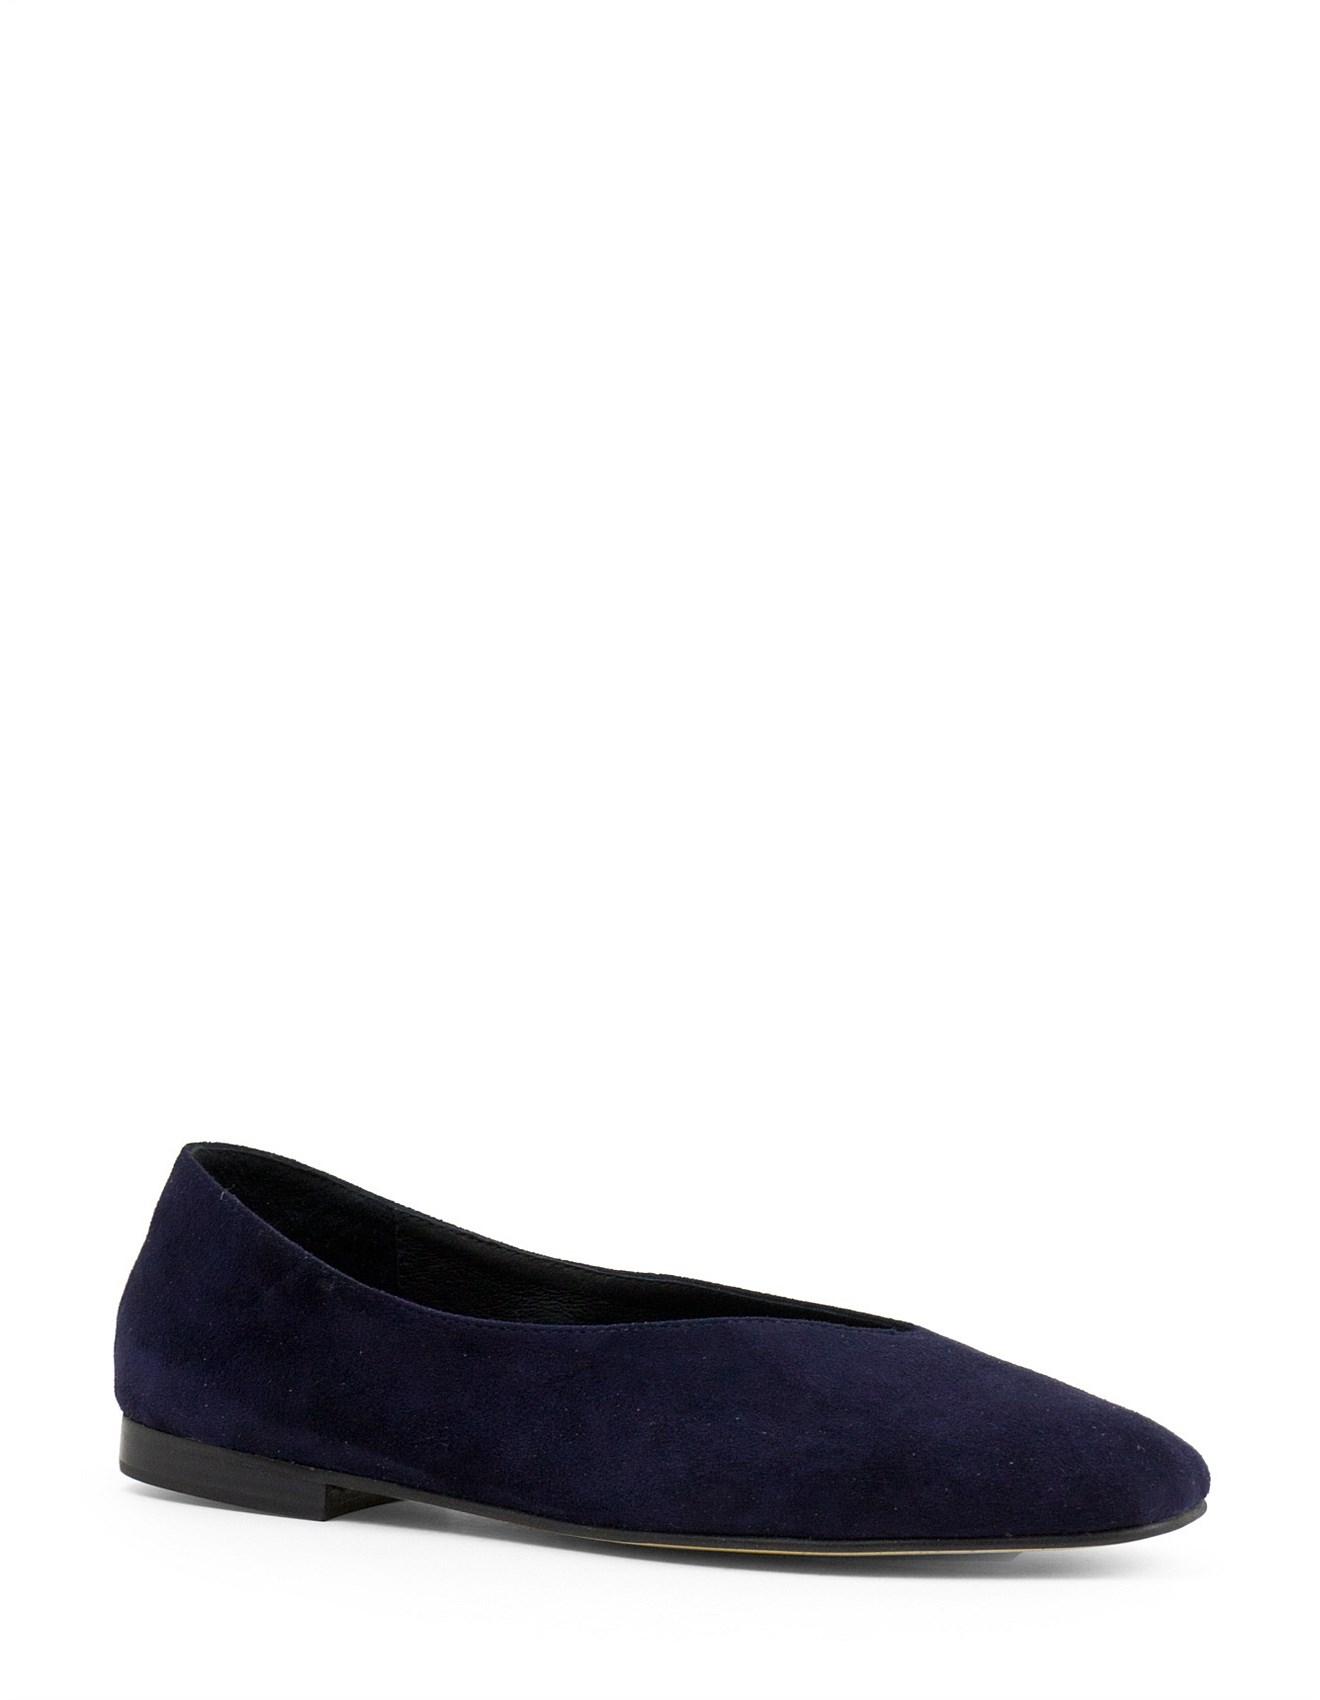 163fe9fd0 Ballet Flats | Buy Ballet Flats Online | David Jones - FANE CLOSED ...